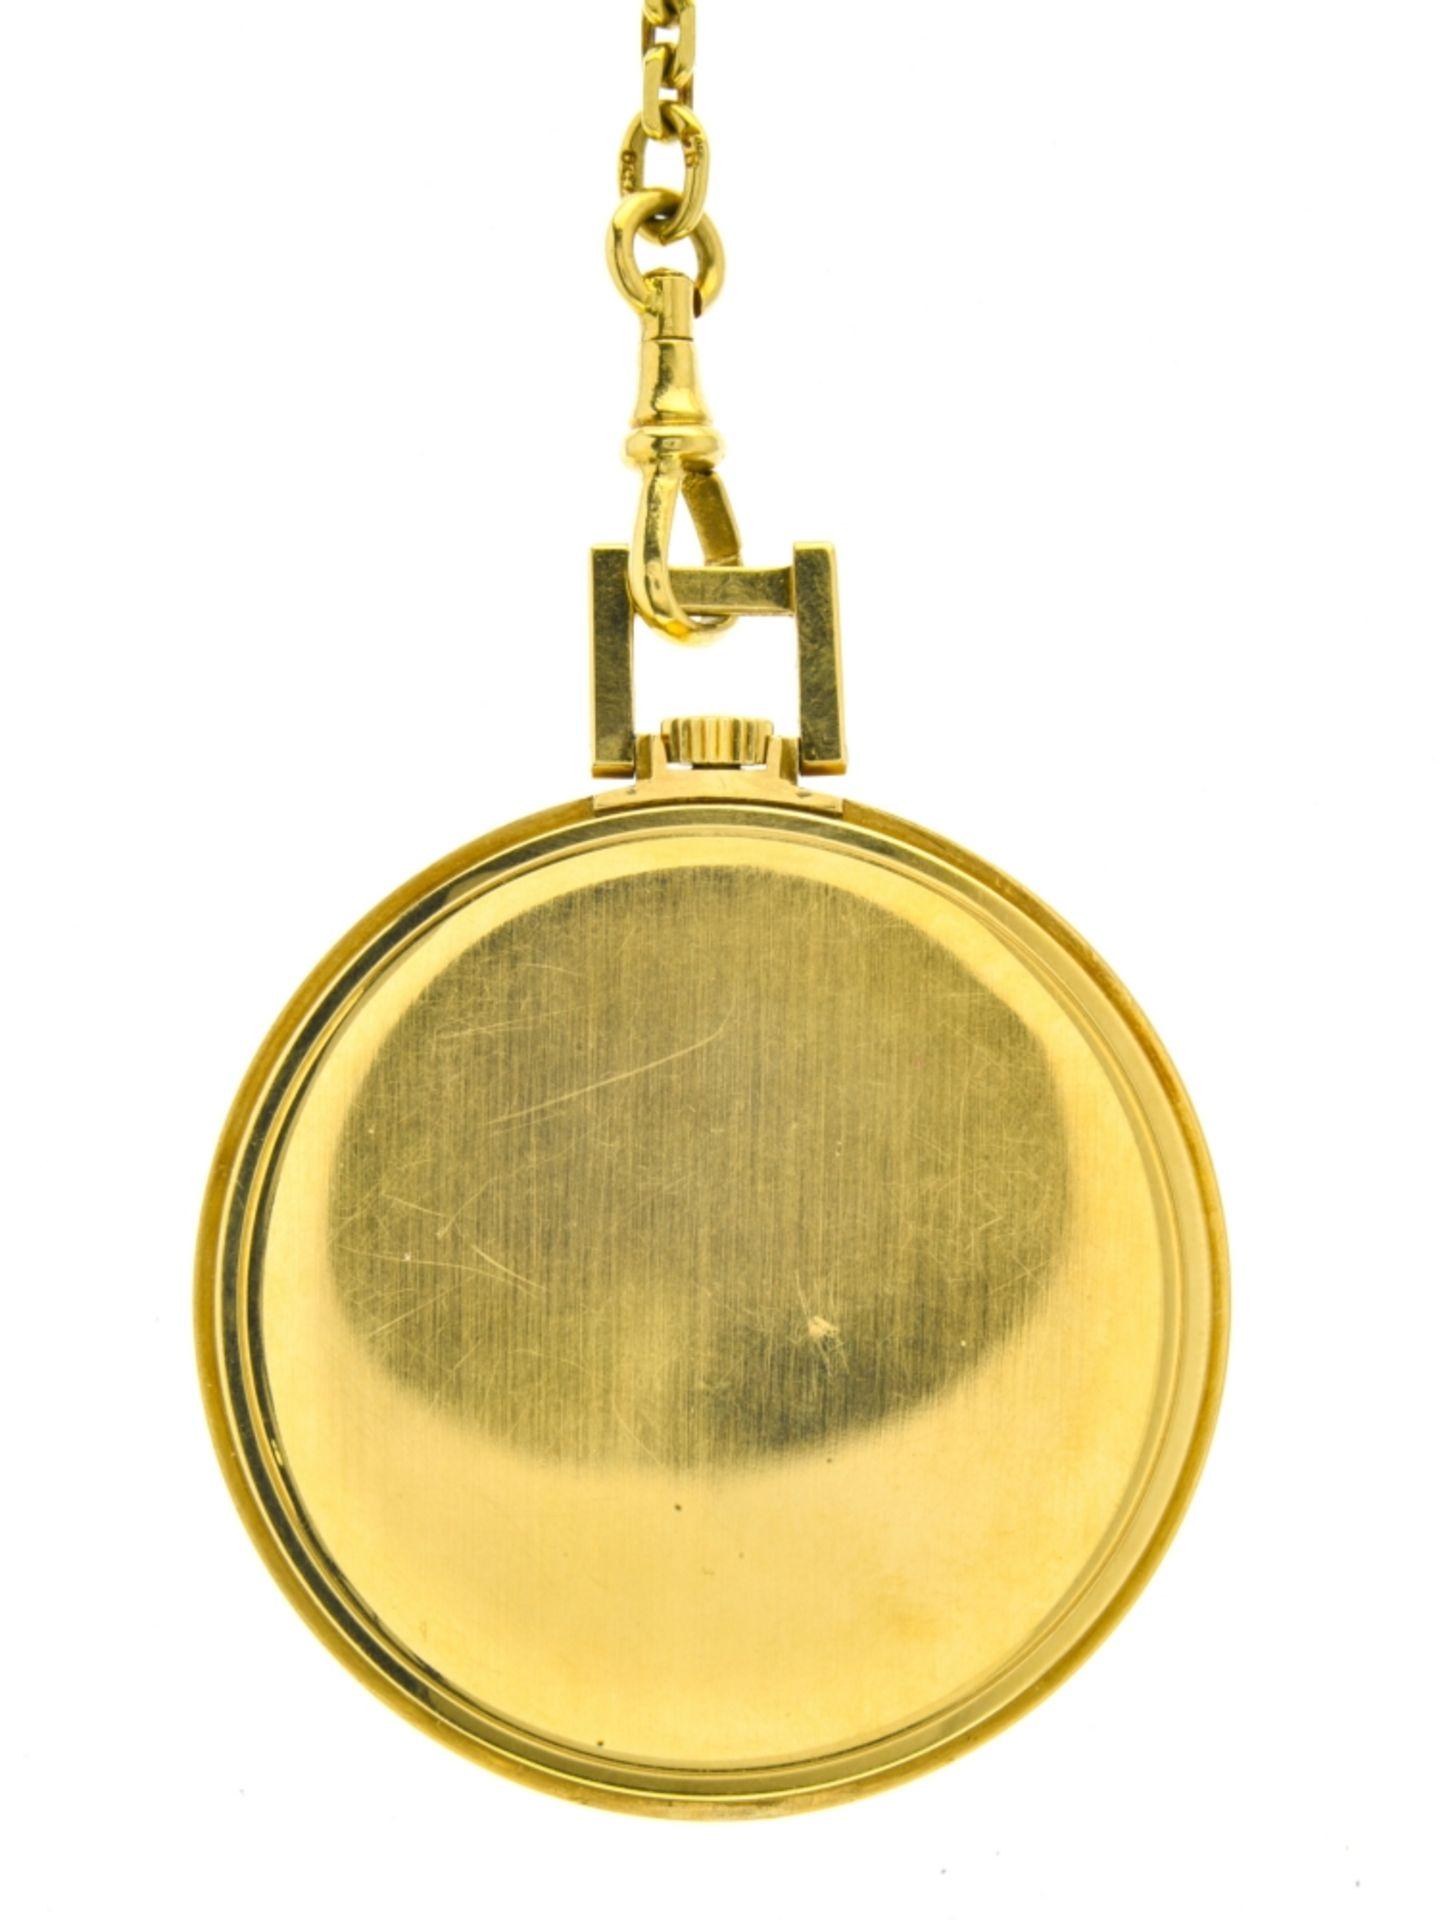 Ulysse Nardin Ulysse Nardin chronometer watch SWITZERLAND 18k gold Ulysse Nardin pocket watch. - Image 2 of 3